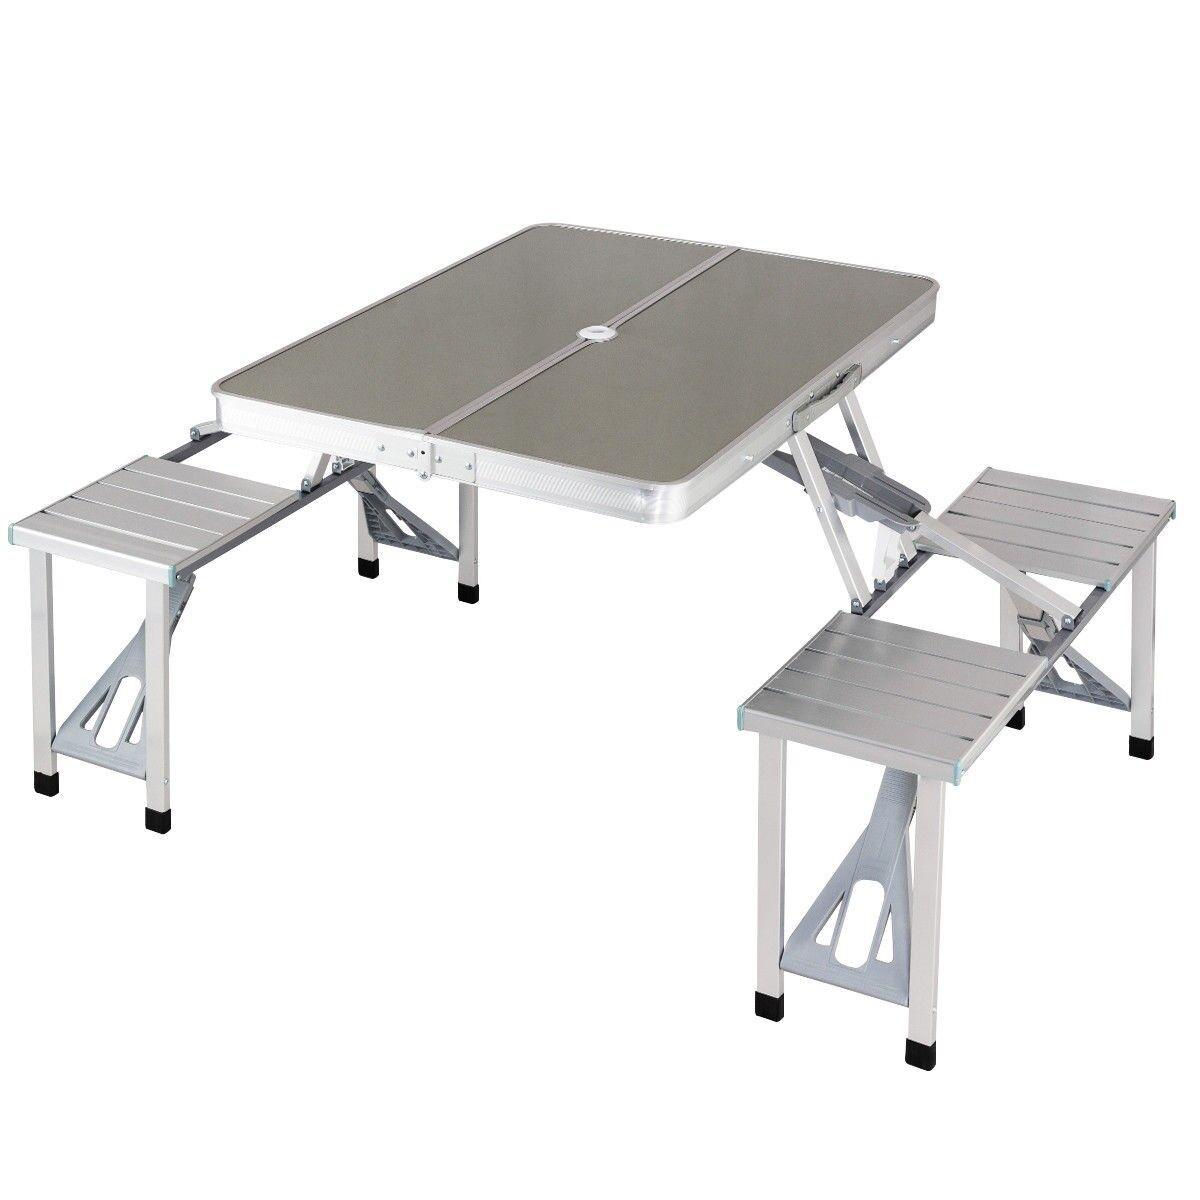 Portable Folding Picnic Table 4 Seats Foldable Aluminum Steel Camping Waterproof